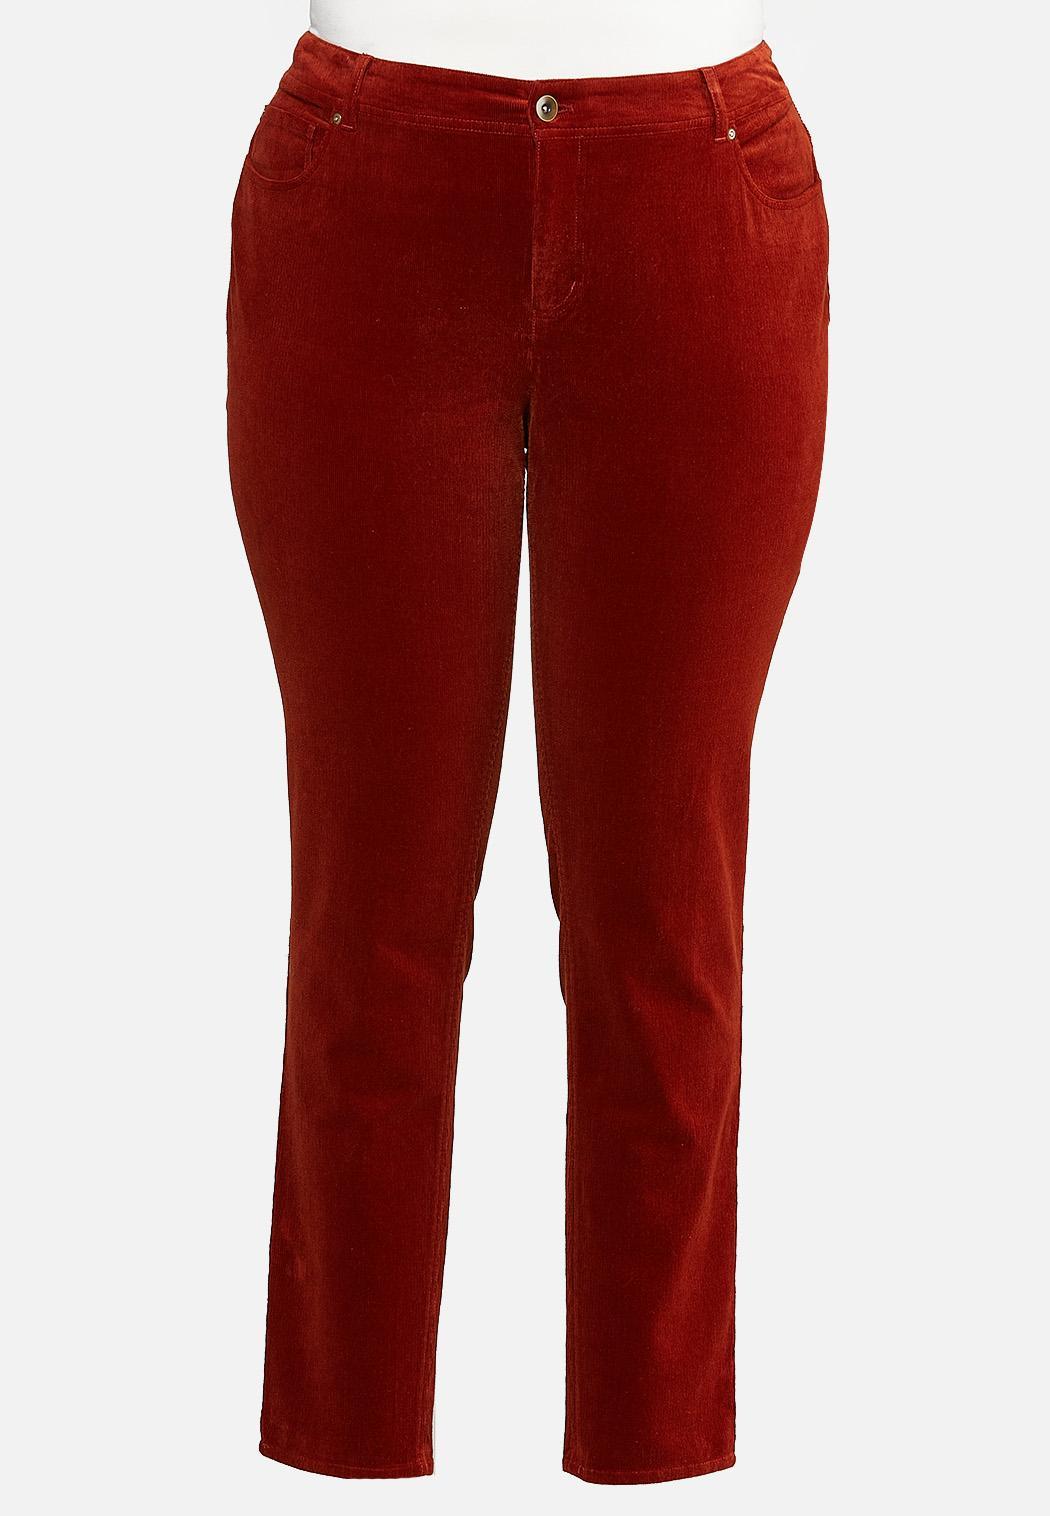 Plus Size Corduroy Slim Pants